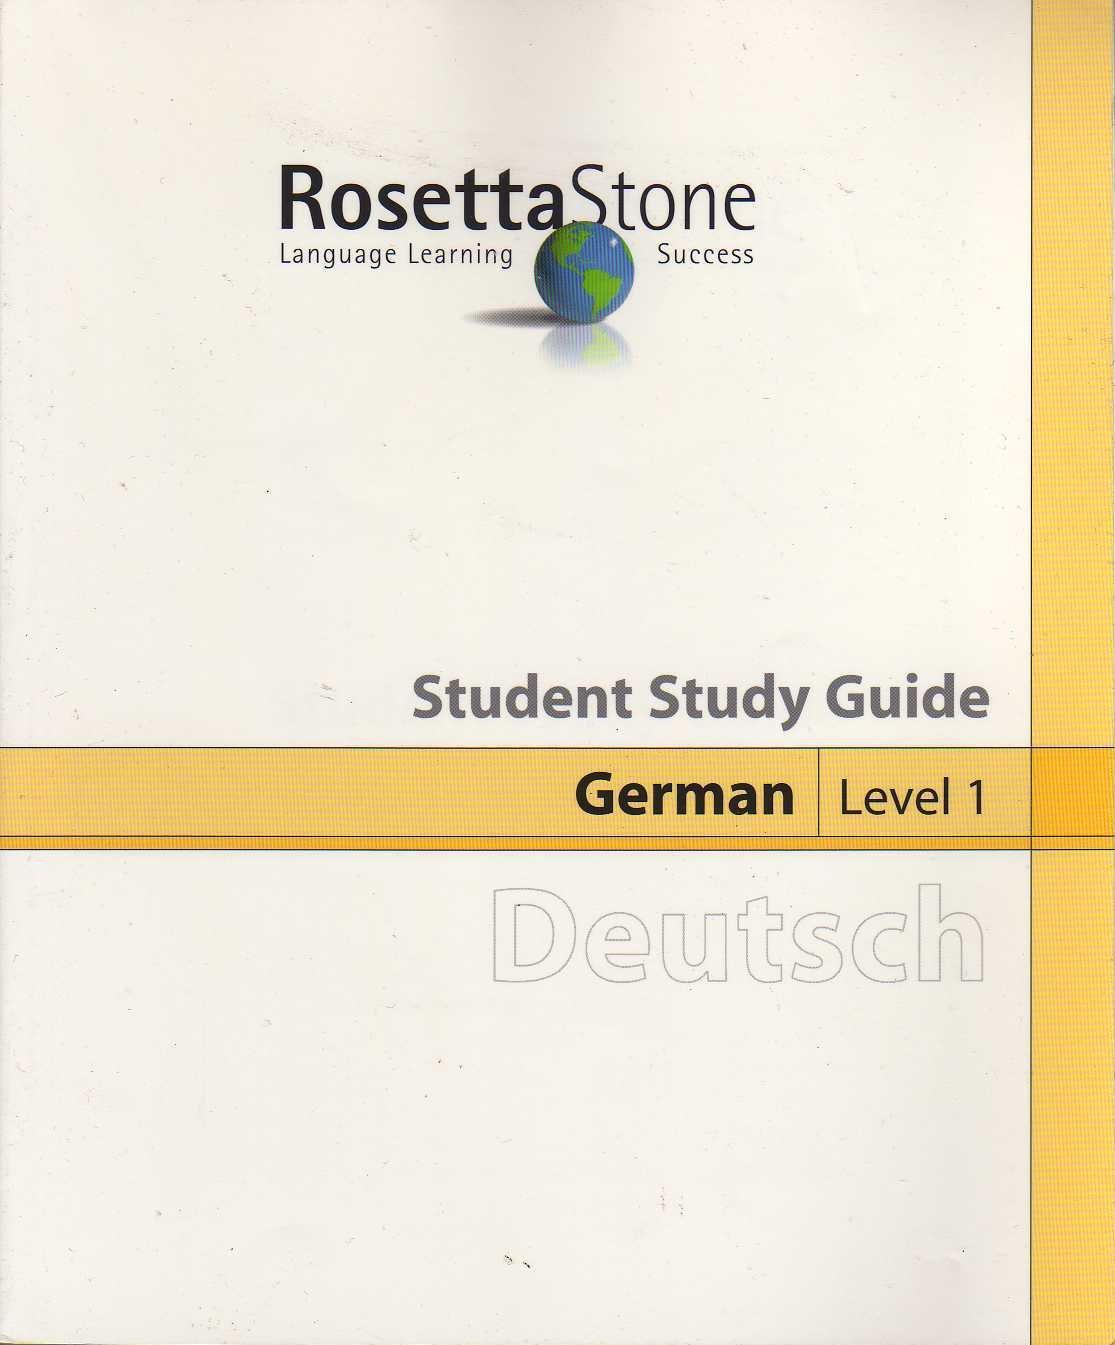 The Rosetta Stone, Student Study Guide: German Level 1 - Deutsch: Ph.D.  Robert Goebel, Ph.D. Ervie L. Glick: 9781580220163: Amazon.com: Books